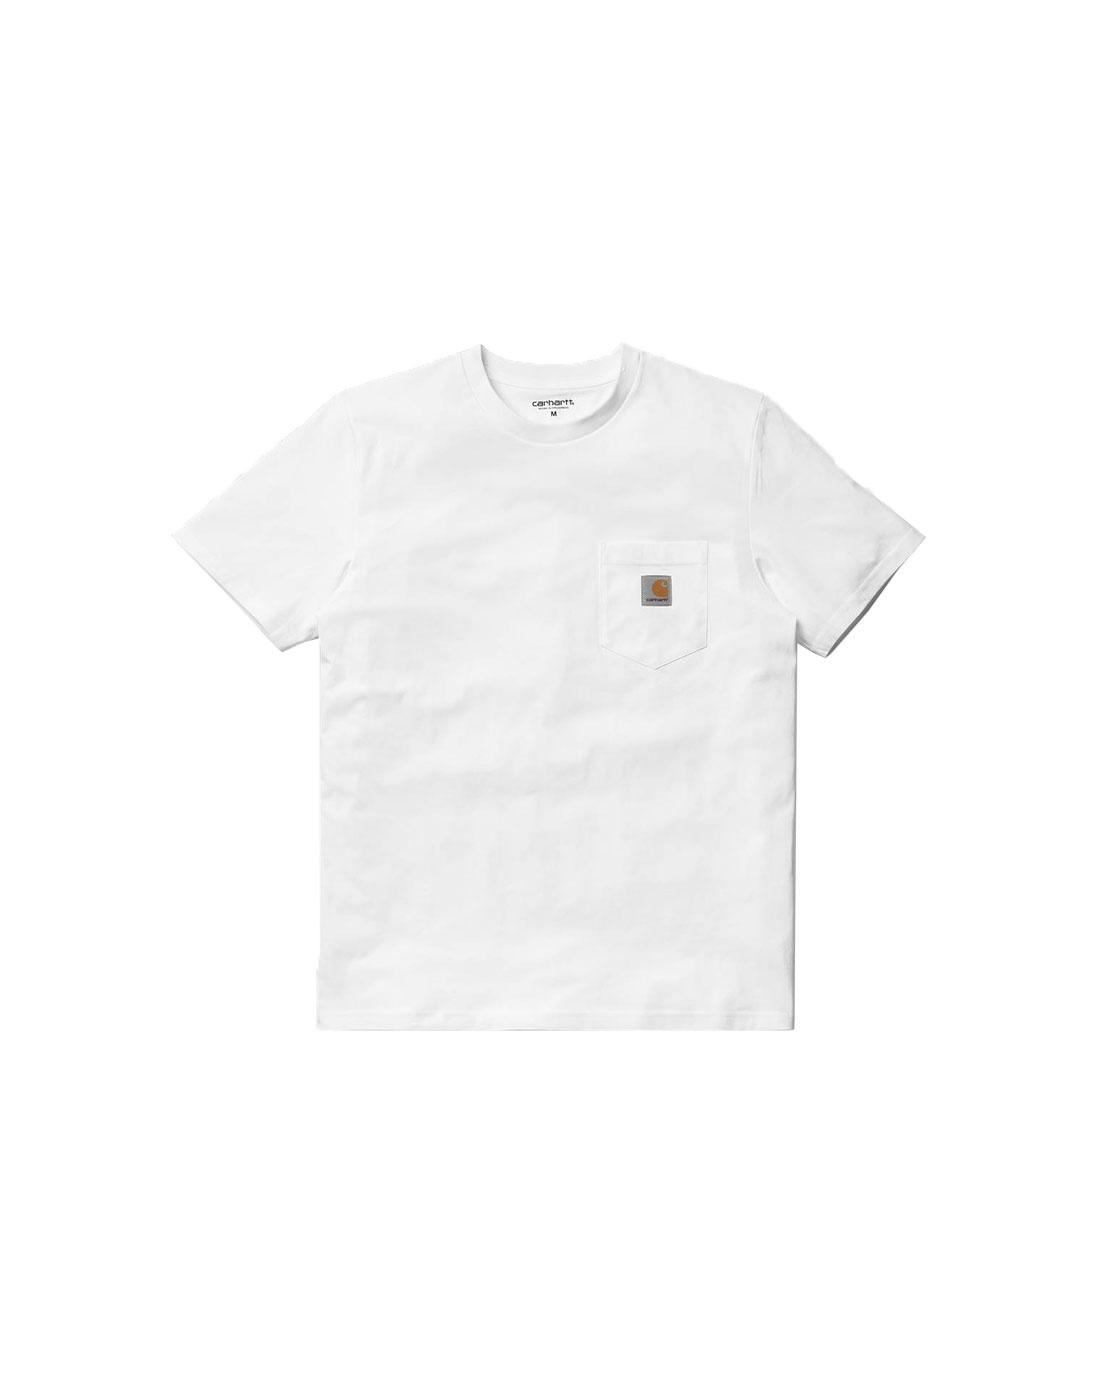 Carhartt WIP Pocket T-Shirt White I022091 - 0200